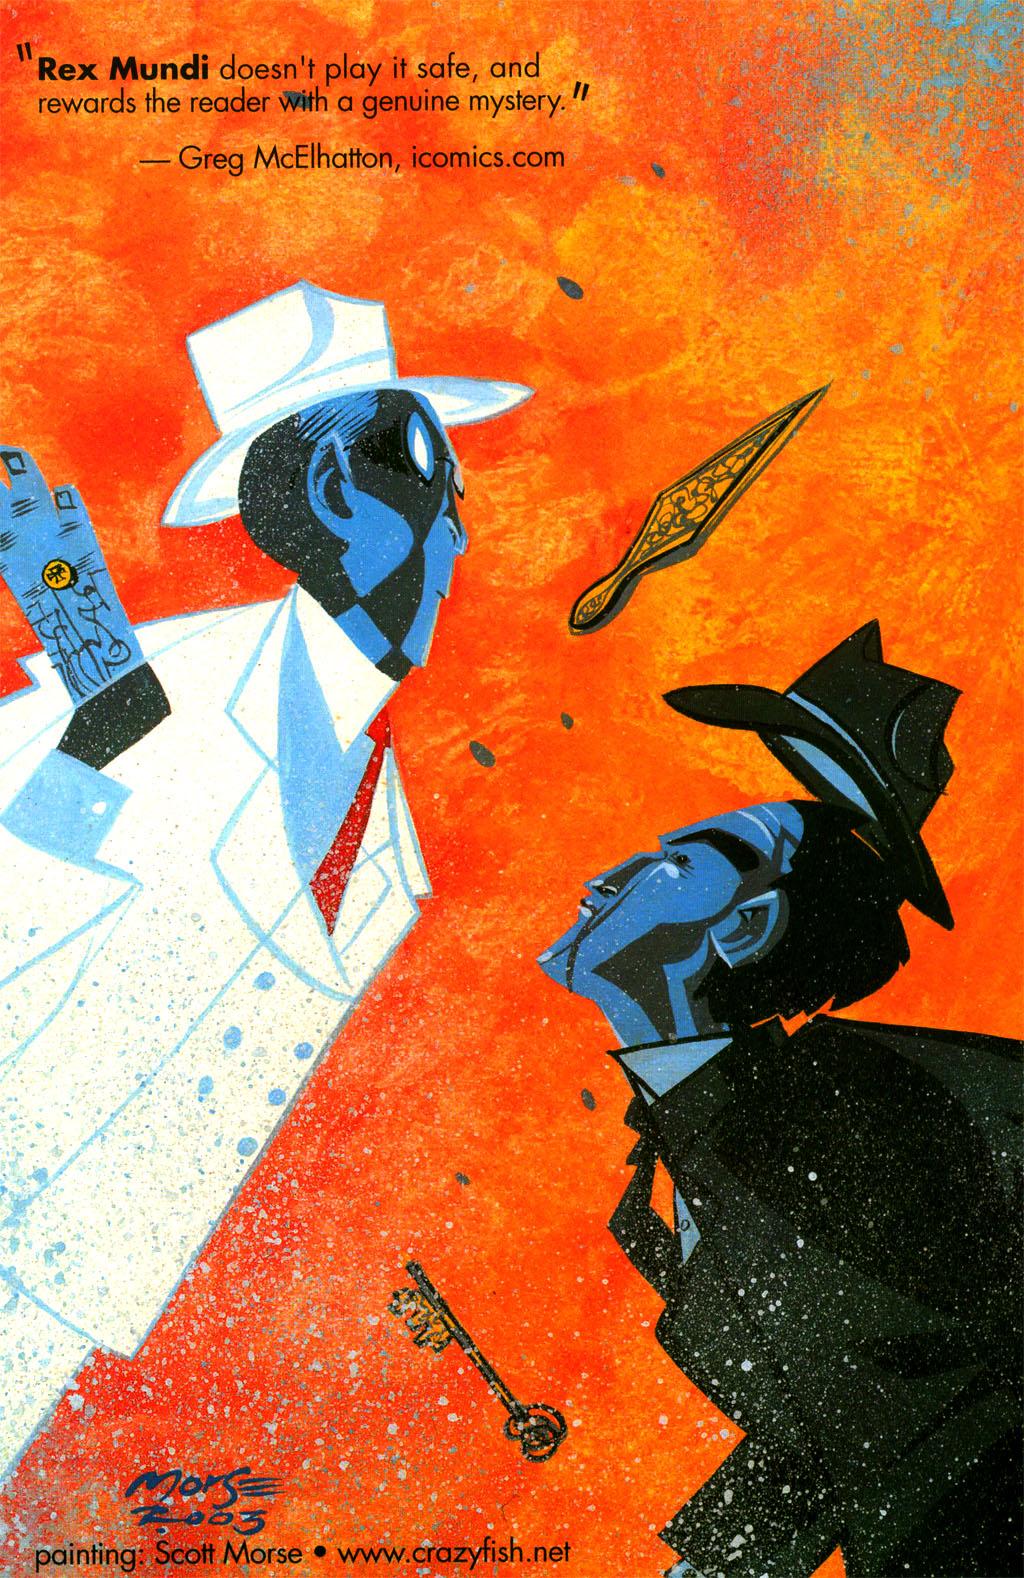 Read online Rex Mundi comic -  Issue #5 - 32